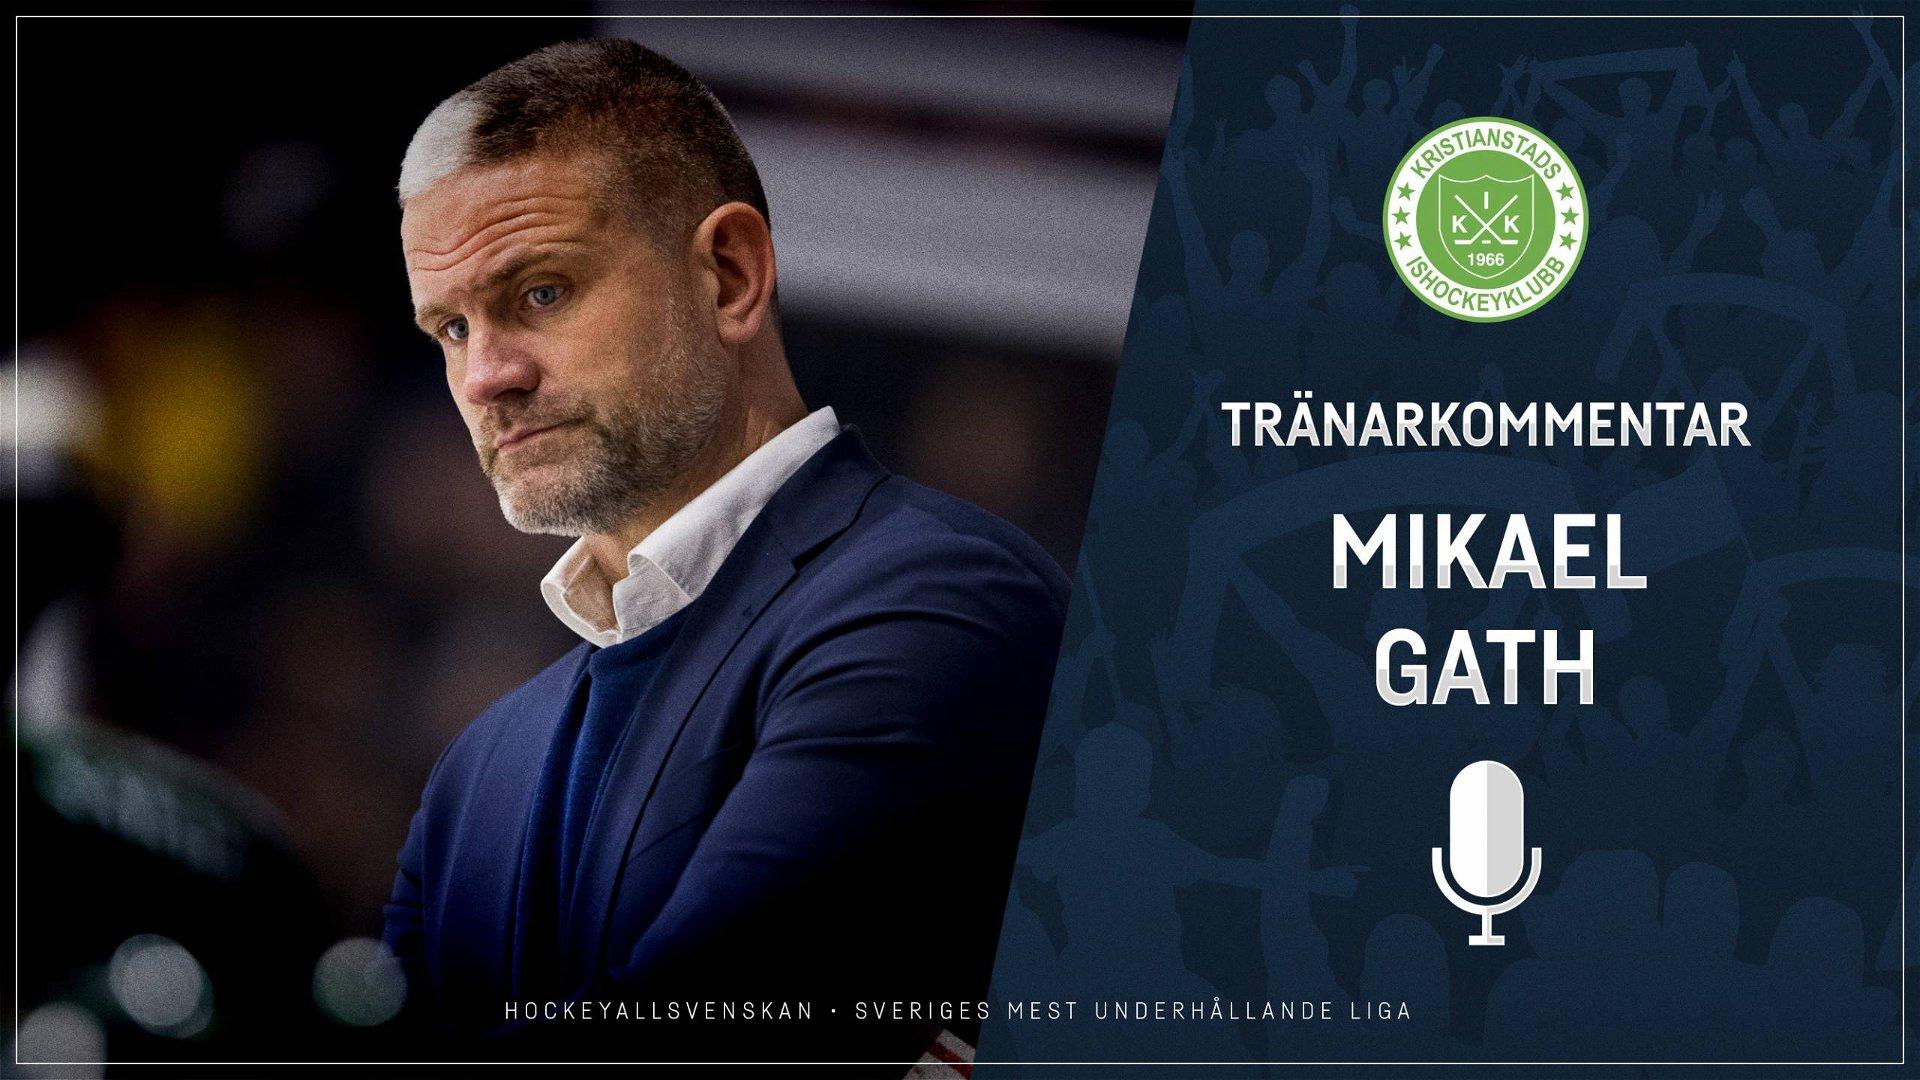 2021-01-15 Segerintervju: Mikael Gath